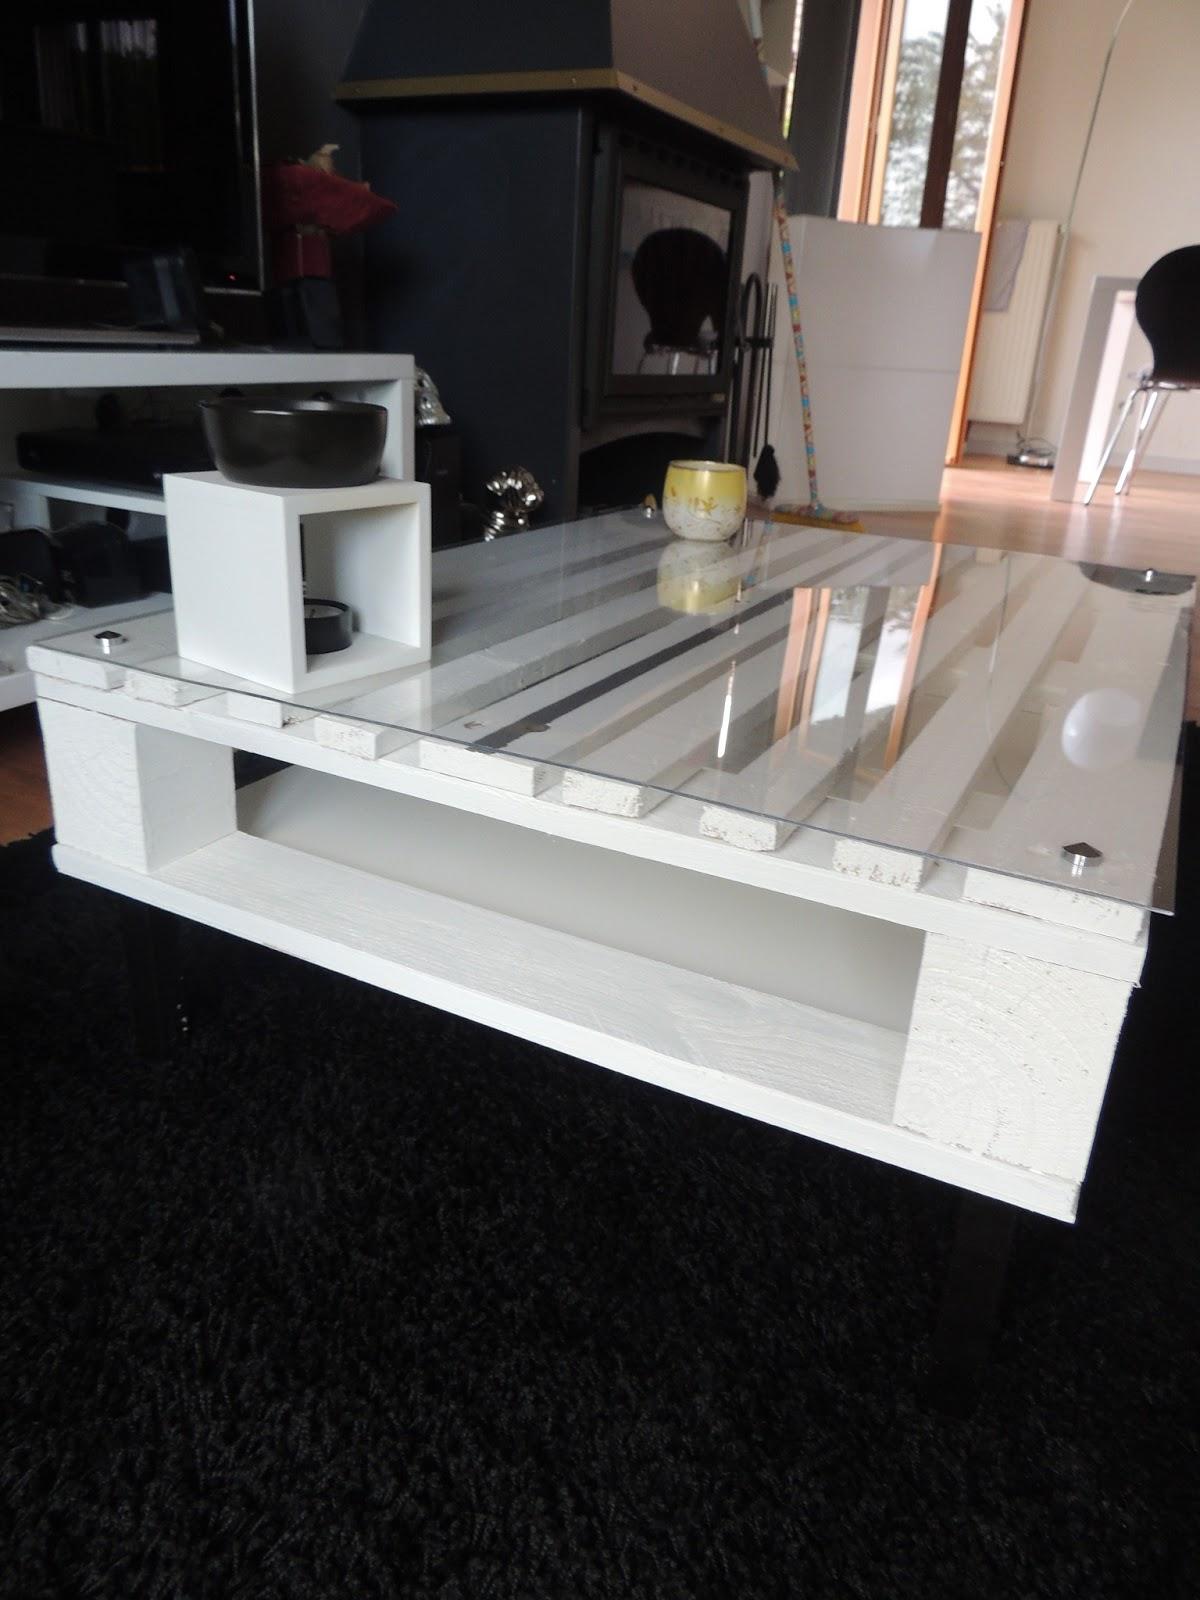 Table Basse Palette Leroy Merlin Urbantrott Com # Mode De Table De Basse